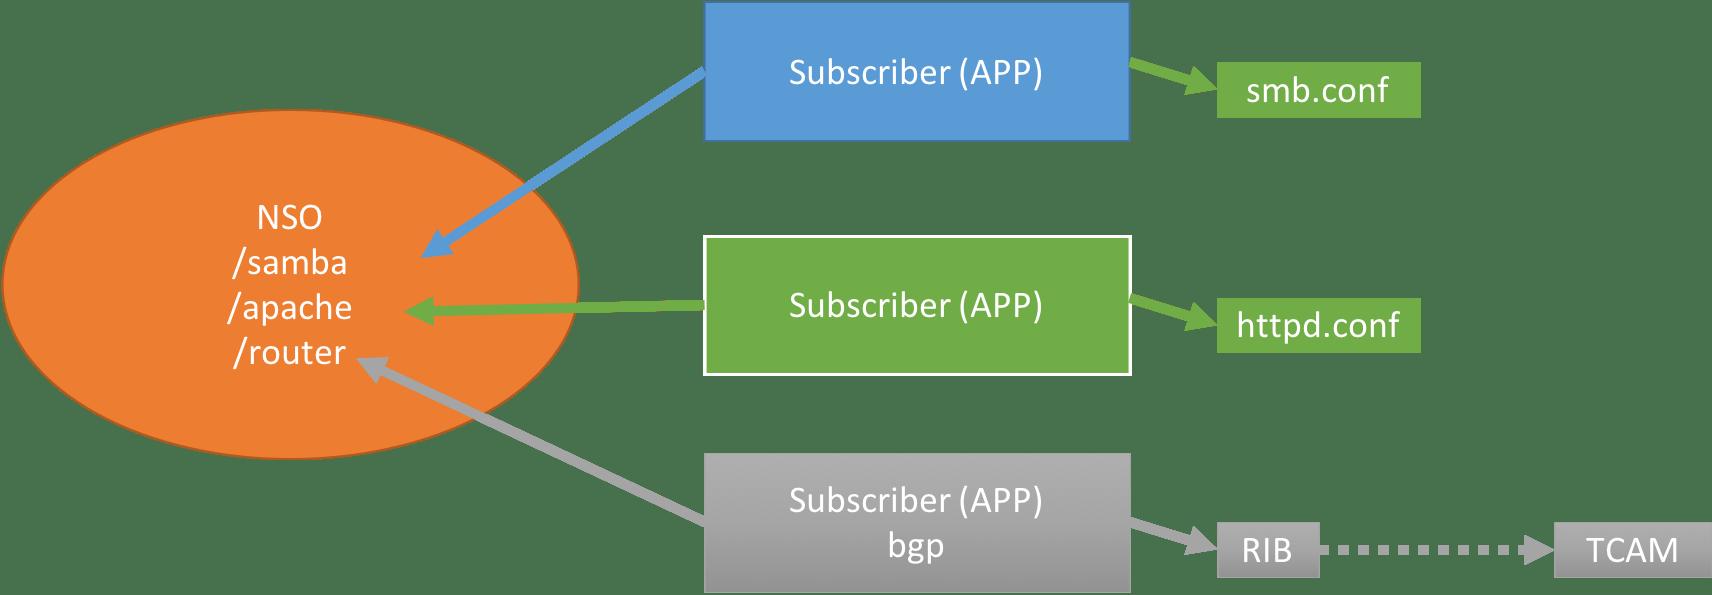 CDB_subscriber.png